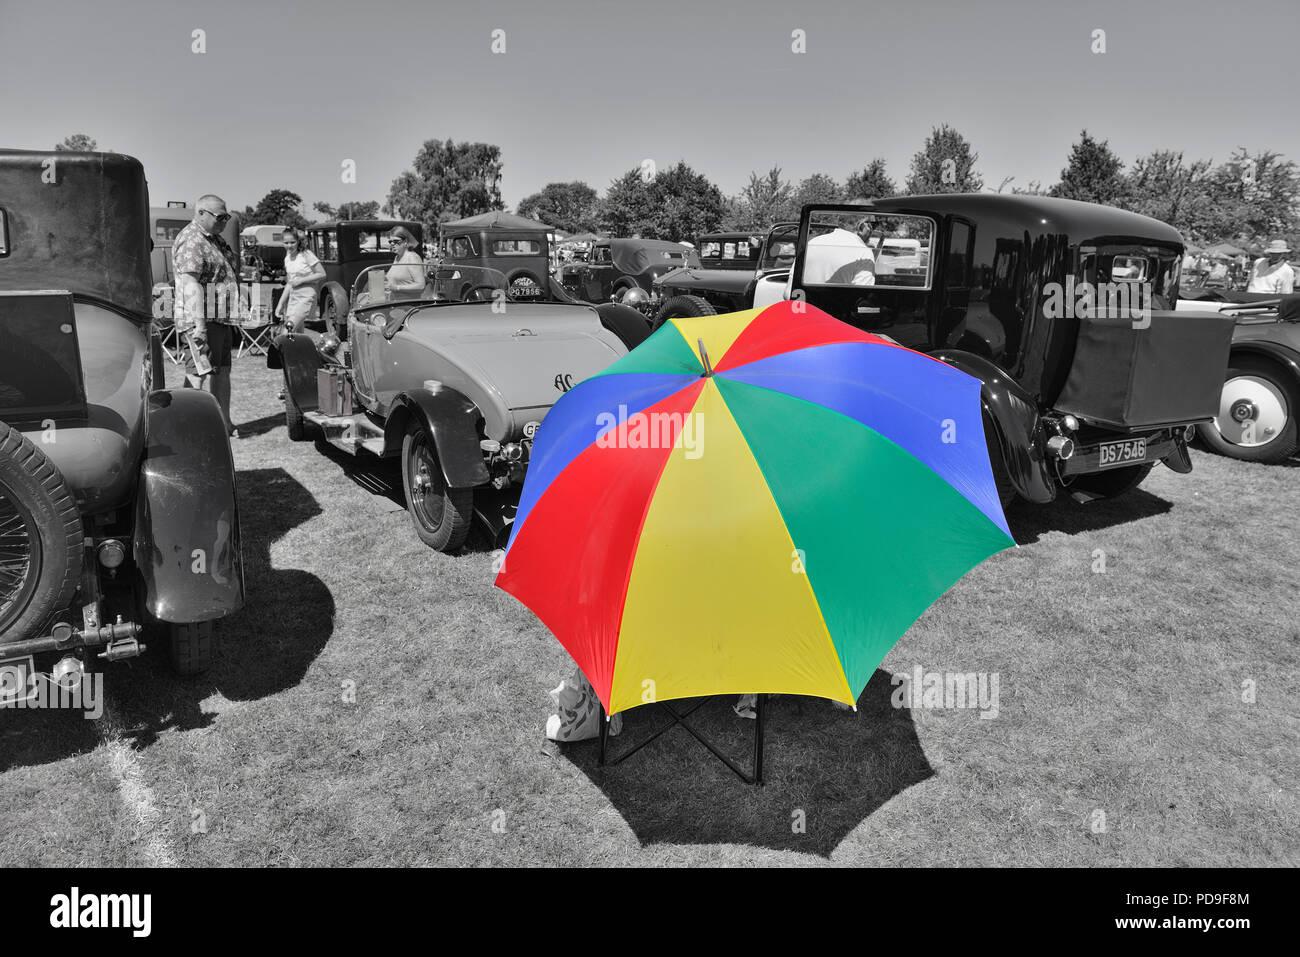 Hooe die Oldtimer Show, East Sussex, England, Großbritannien Stockbild